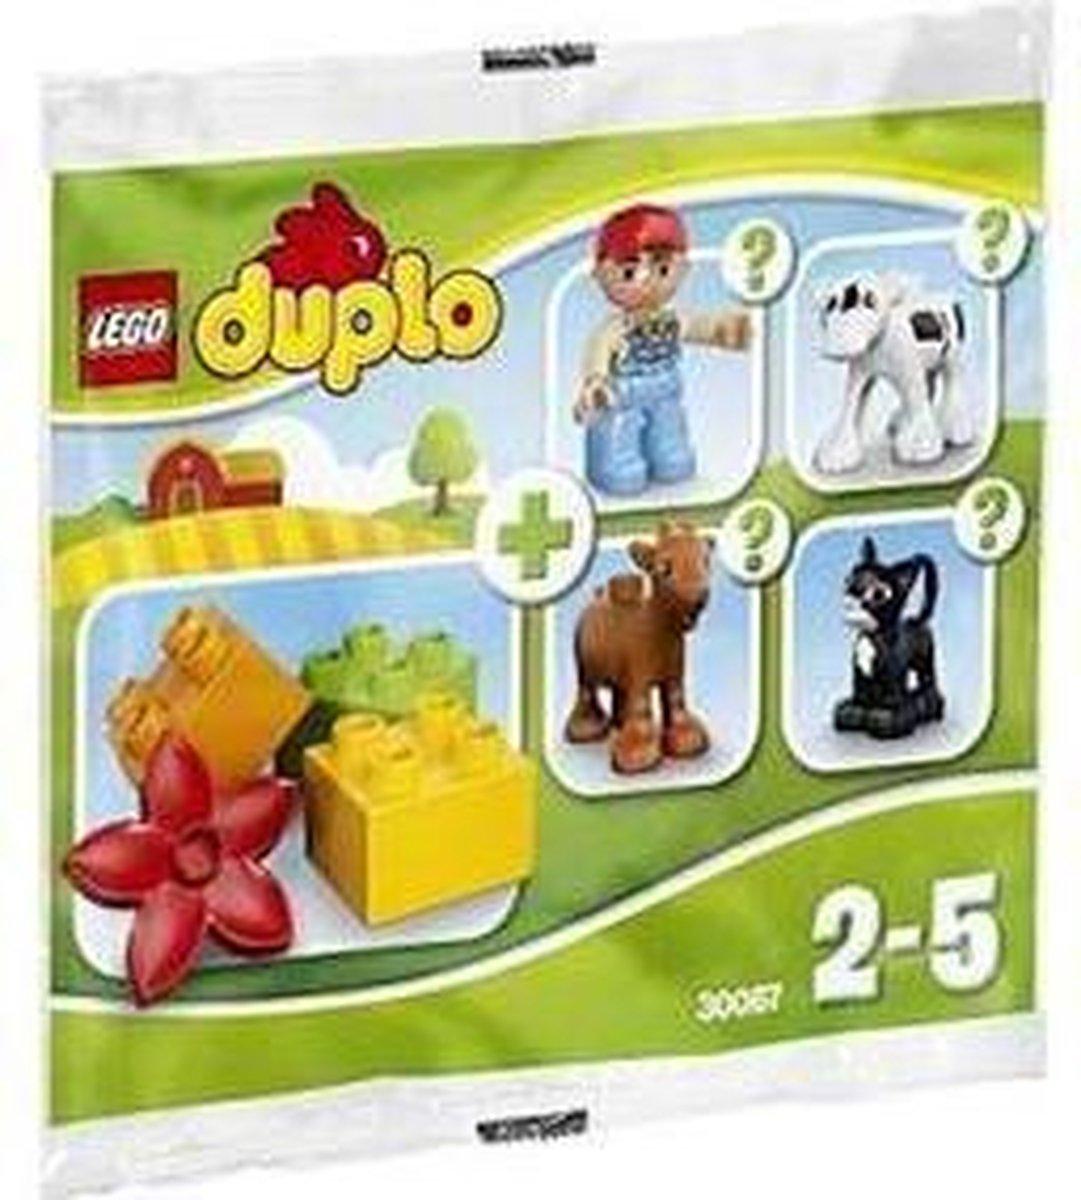 LEGO 30067 Duplo boerderij polybag